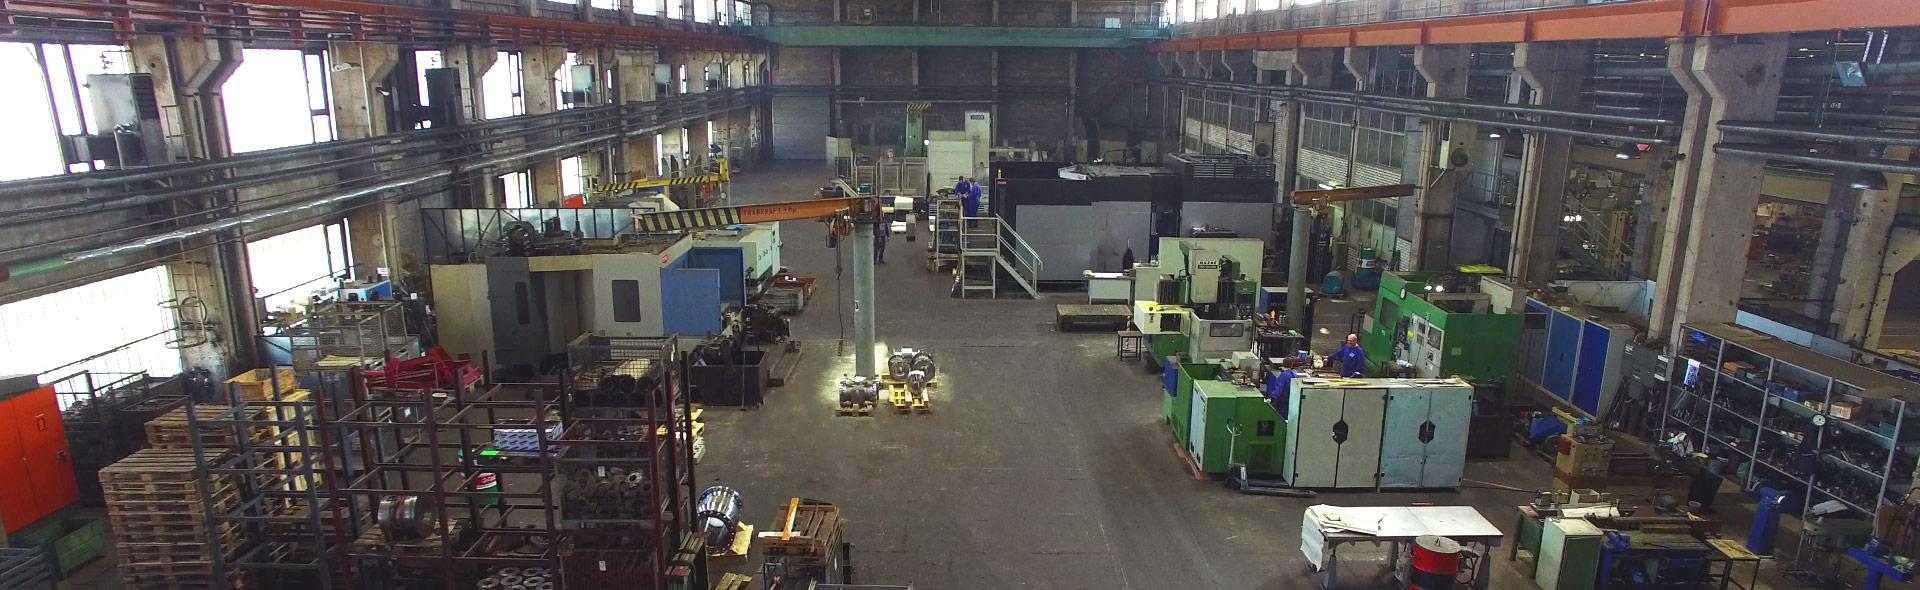 Maschinenbau Mundil GmbH & Co. KG